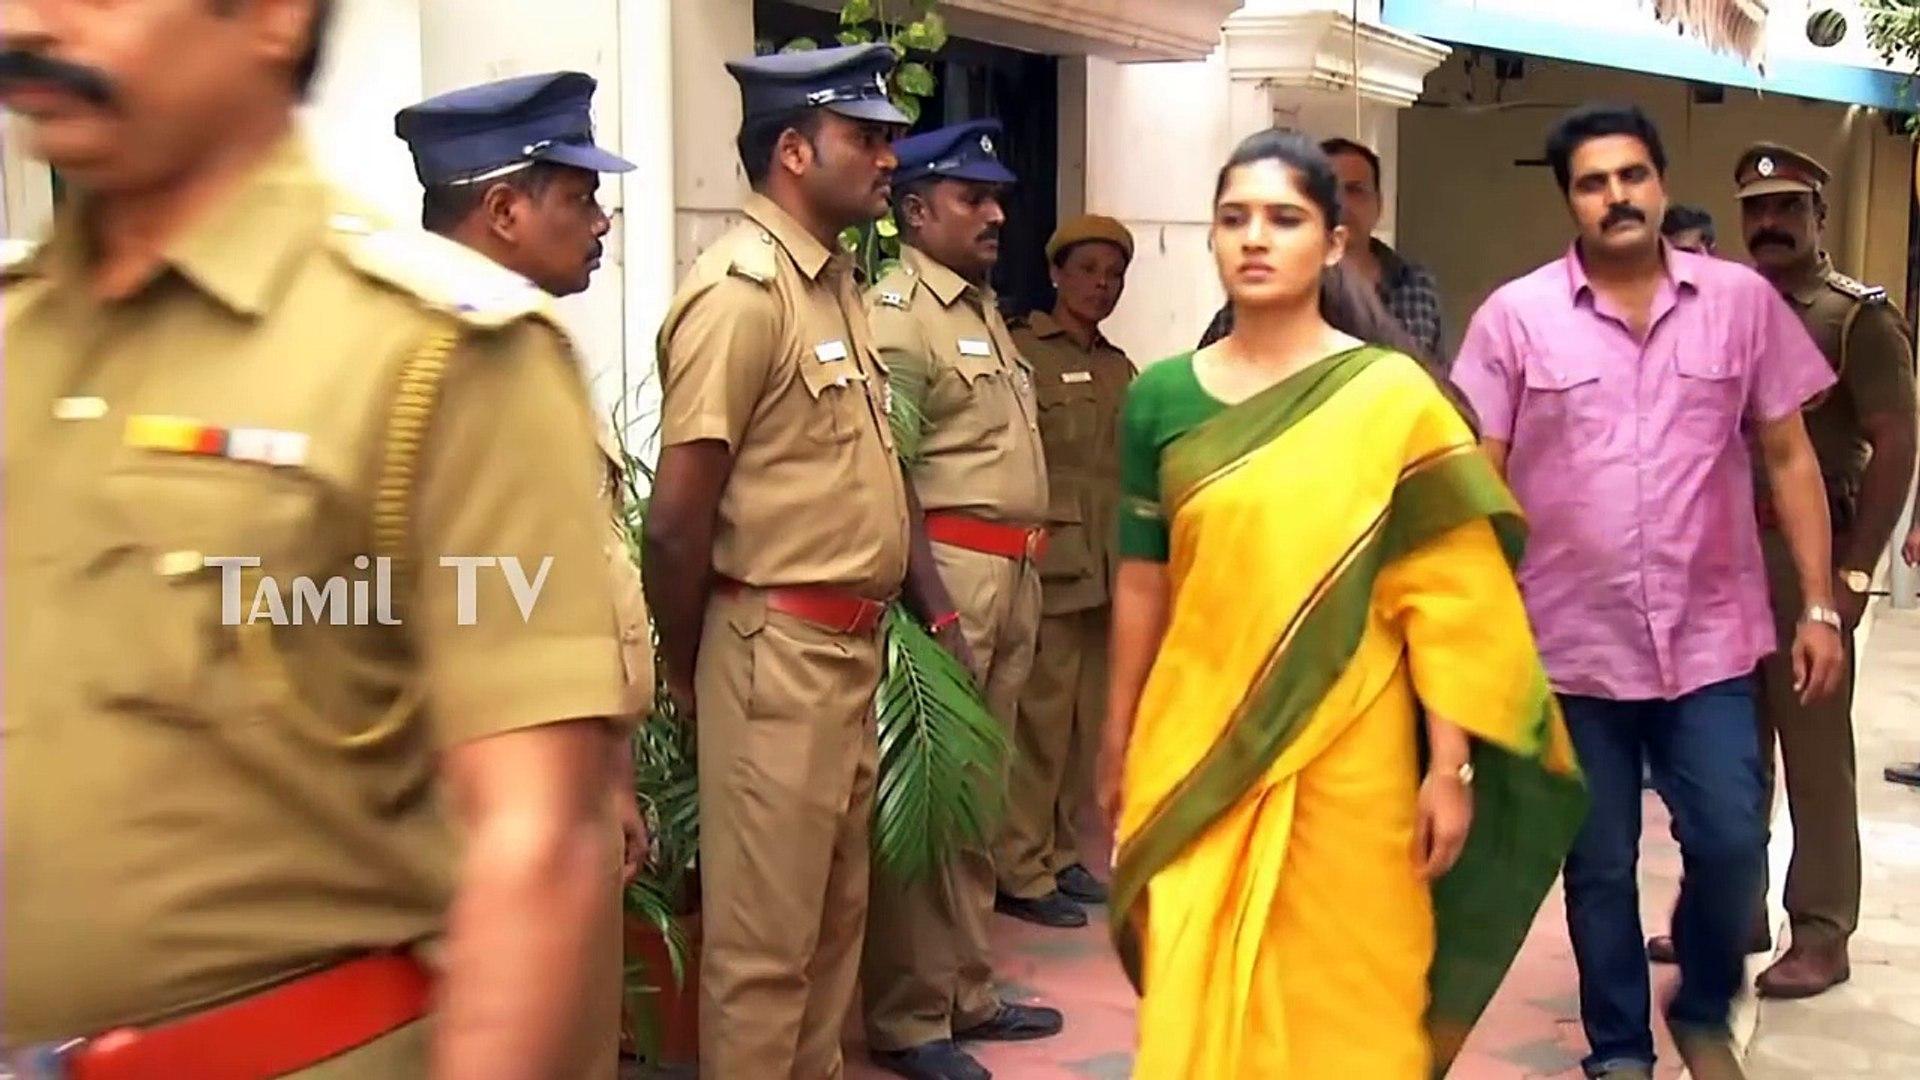 Deivamagal Episode 28/12/17 Tamil Serial Review